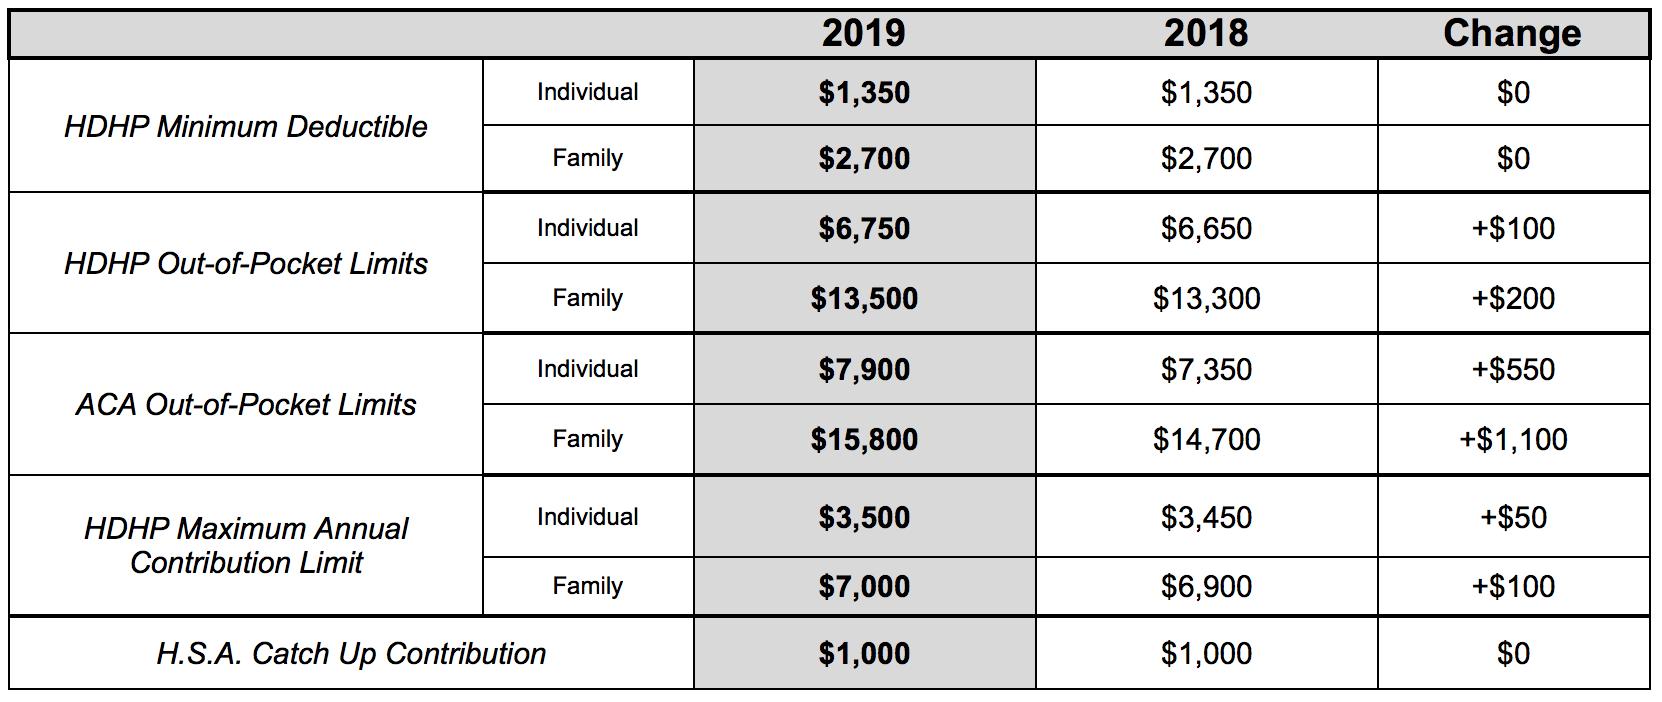 2018-2019-IRS-HSA-Comparison